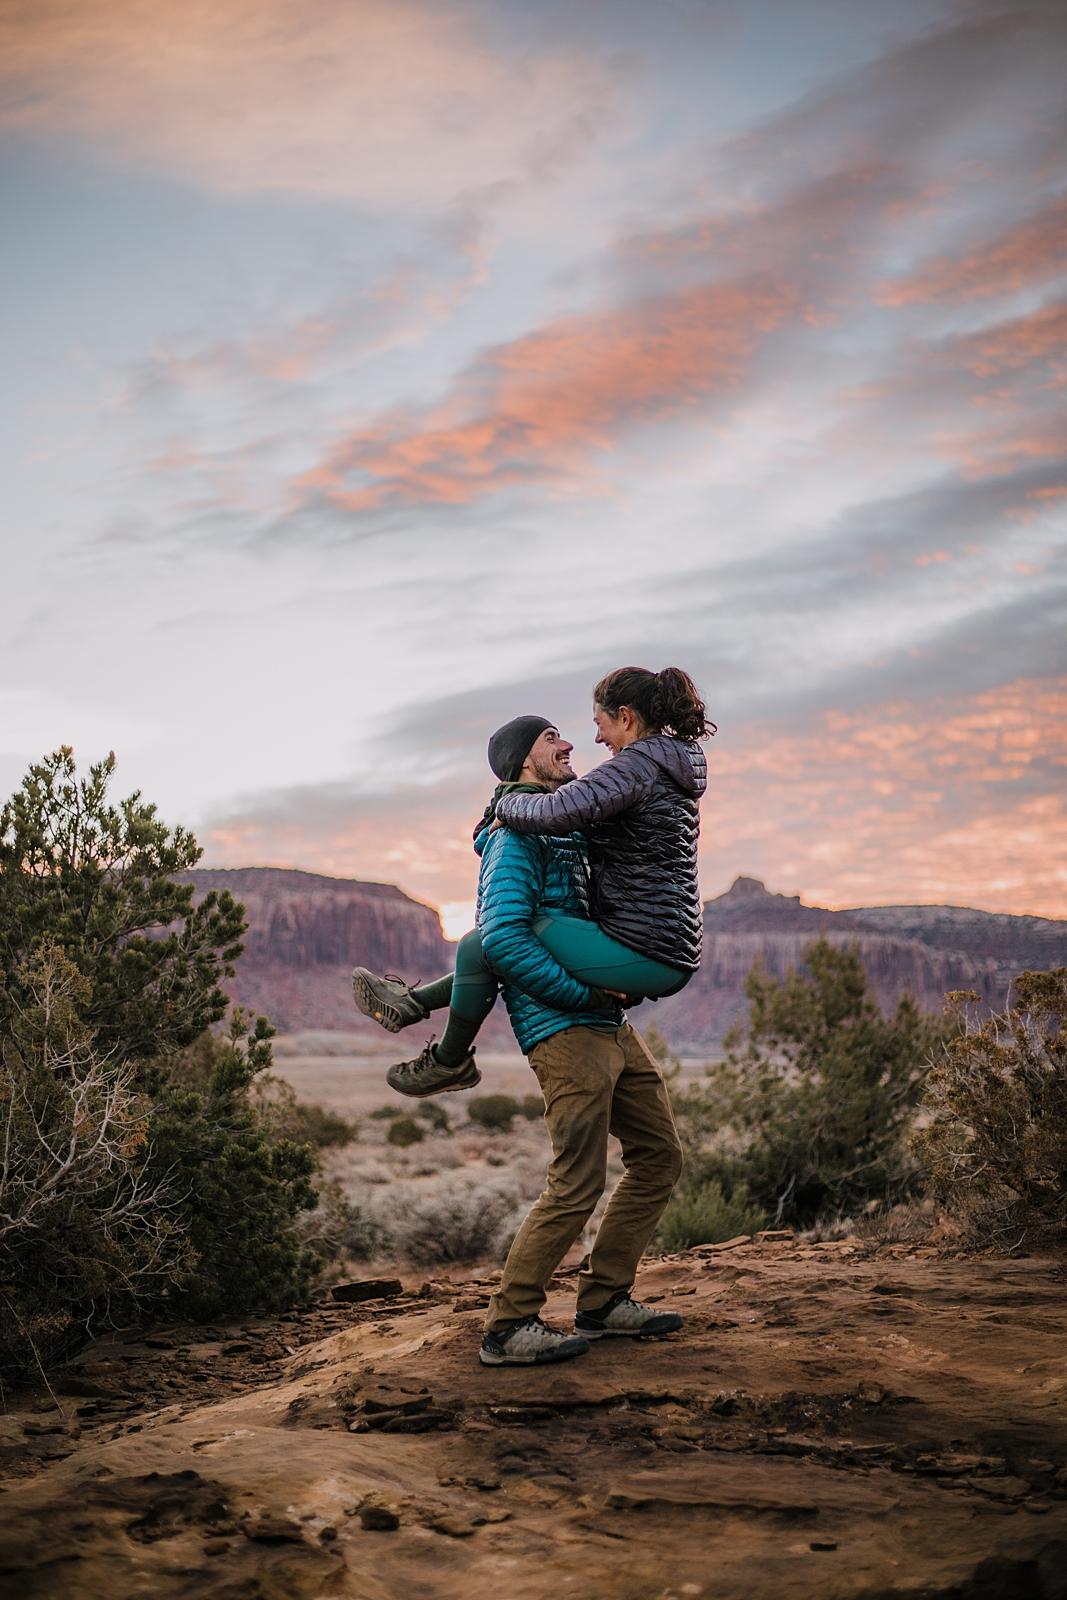 epic sunrise in indian creek monticello utah, sunrise climbing in indian creek, moab utah, engagements, desert love, hiking in moab, hiking in indian creek, indian creek elopement